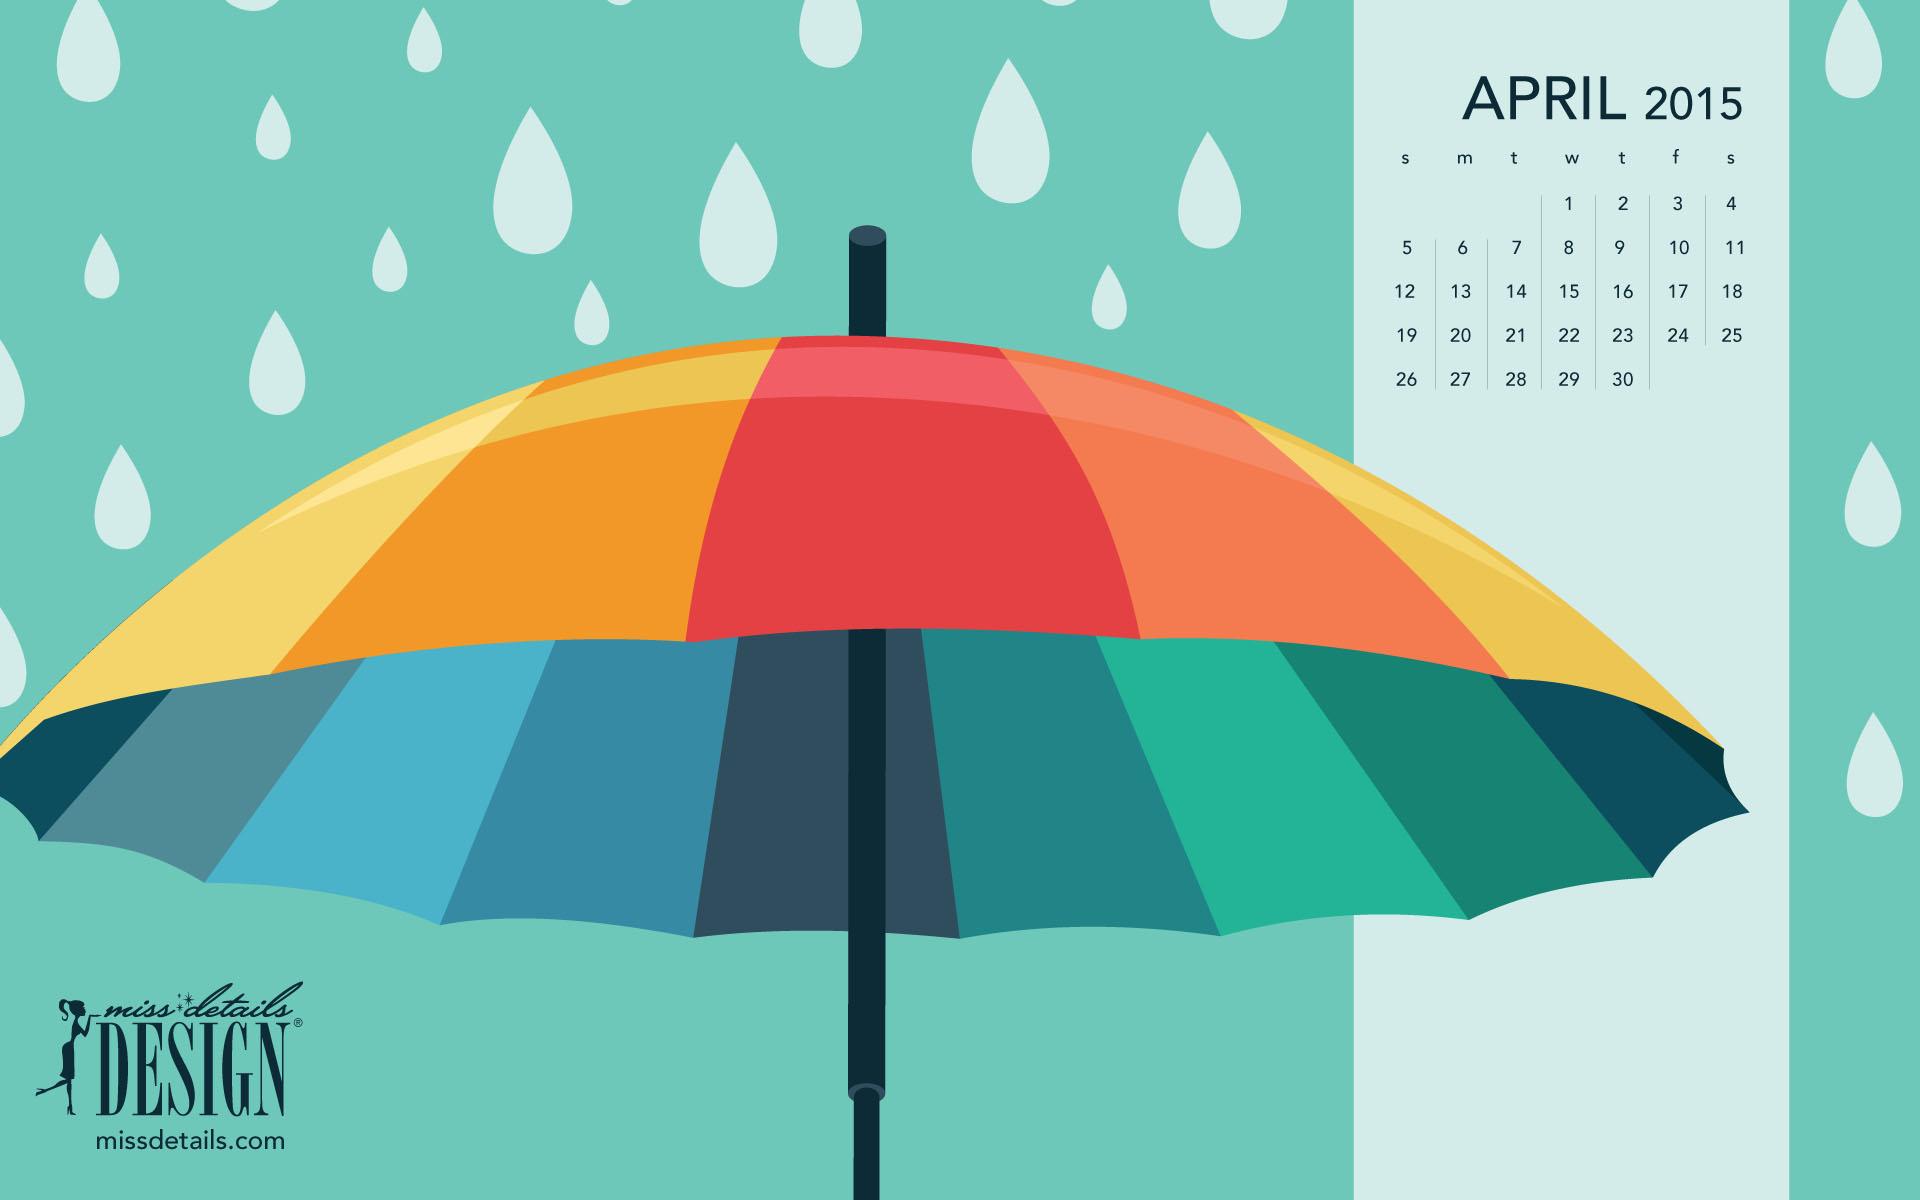 April 2015 desktop calendar from missdetailscom   April Showers 1920x1200